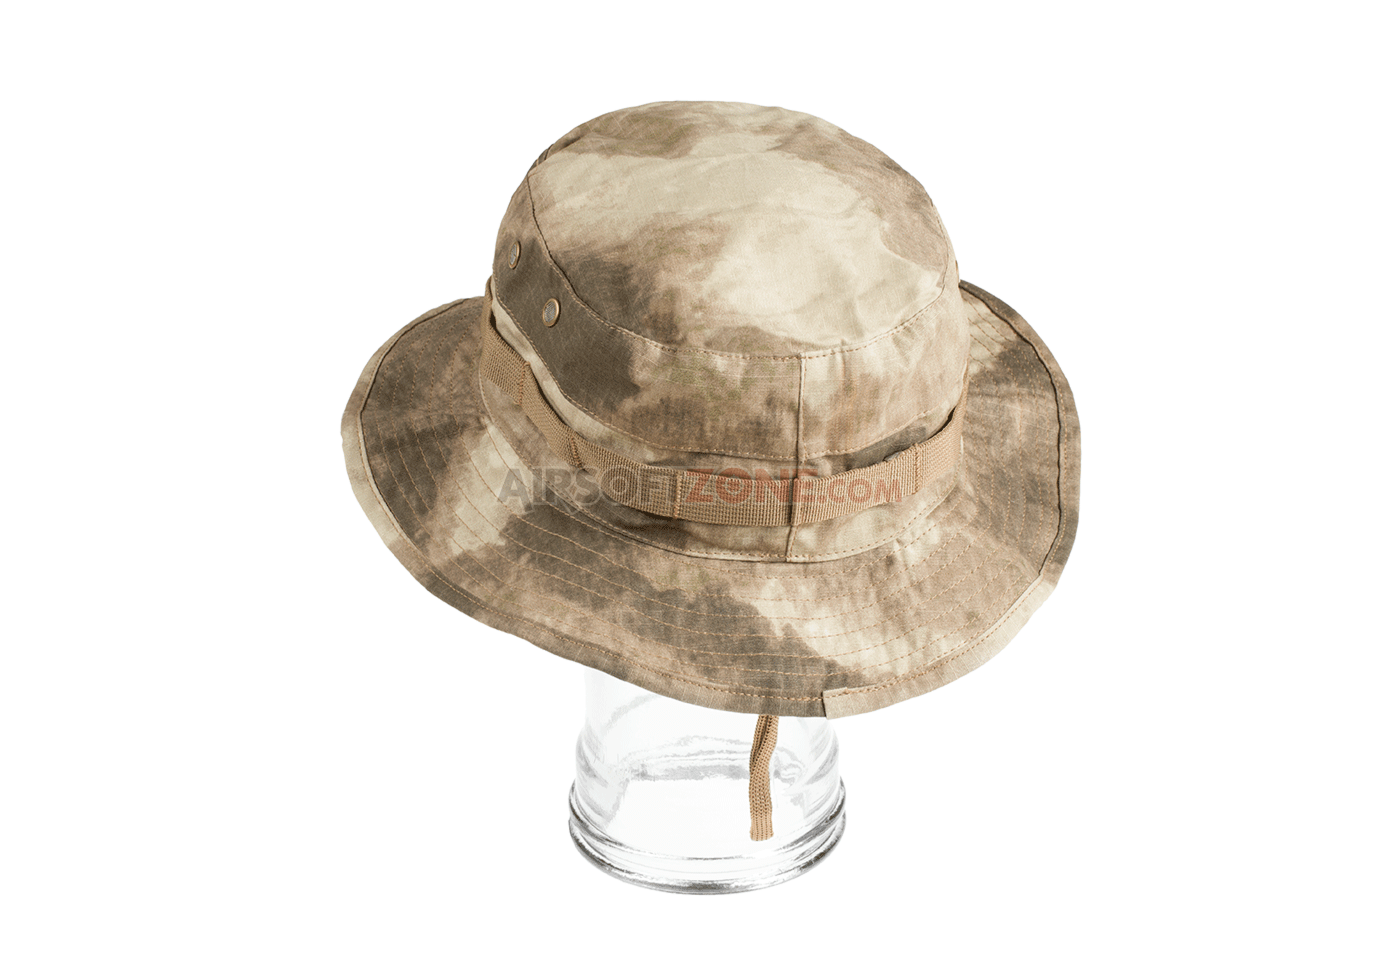 cf5259fcab3 Boonie Hat Stone Desert (Invader Gear) 59   L - Boonies - Headwear -  Garments - airsoftzone.com Online shop